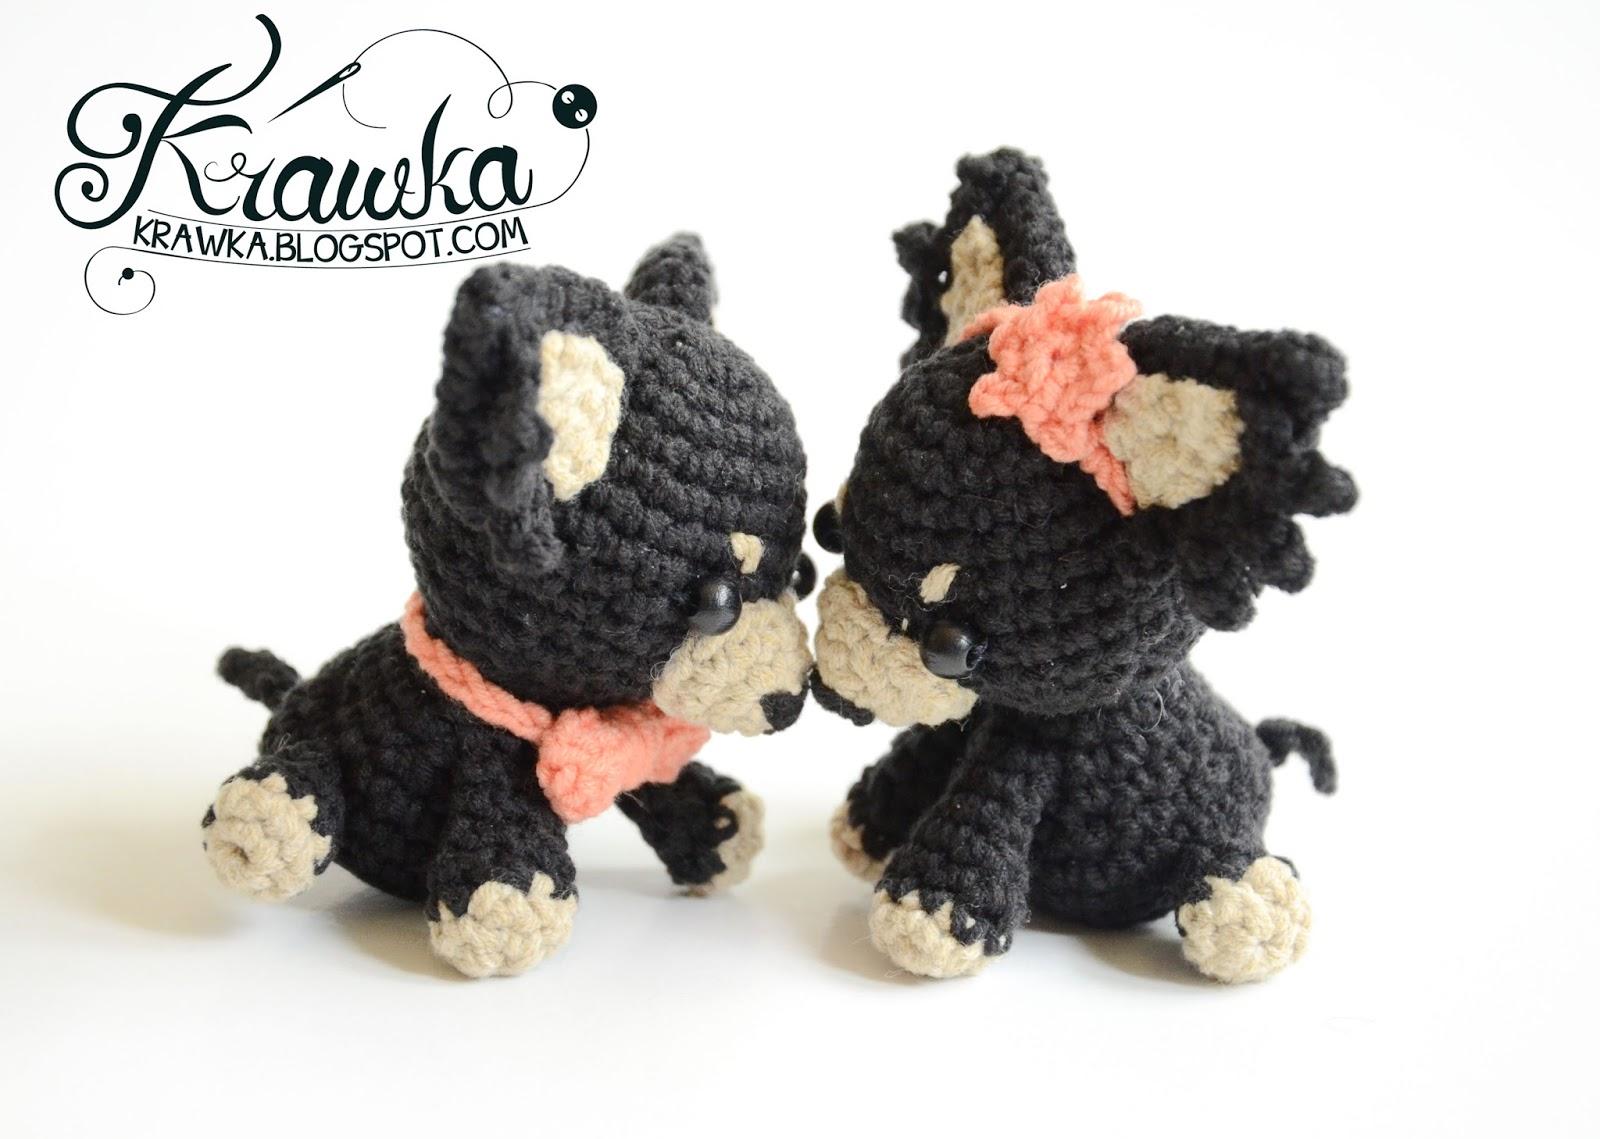 Krawka: Wedding dogs - wedding gift free pattern